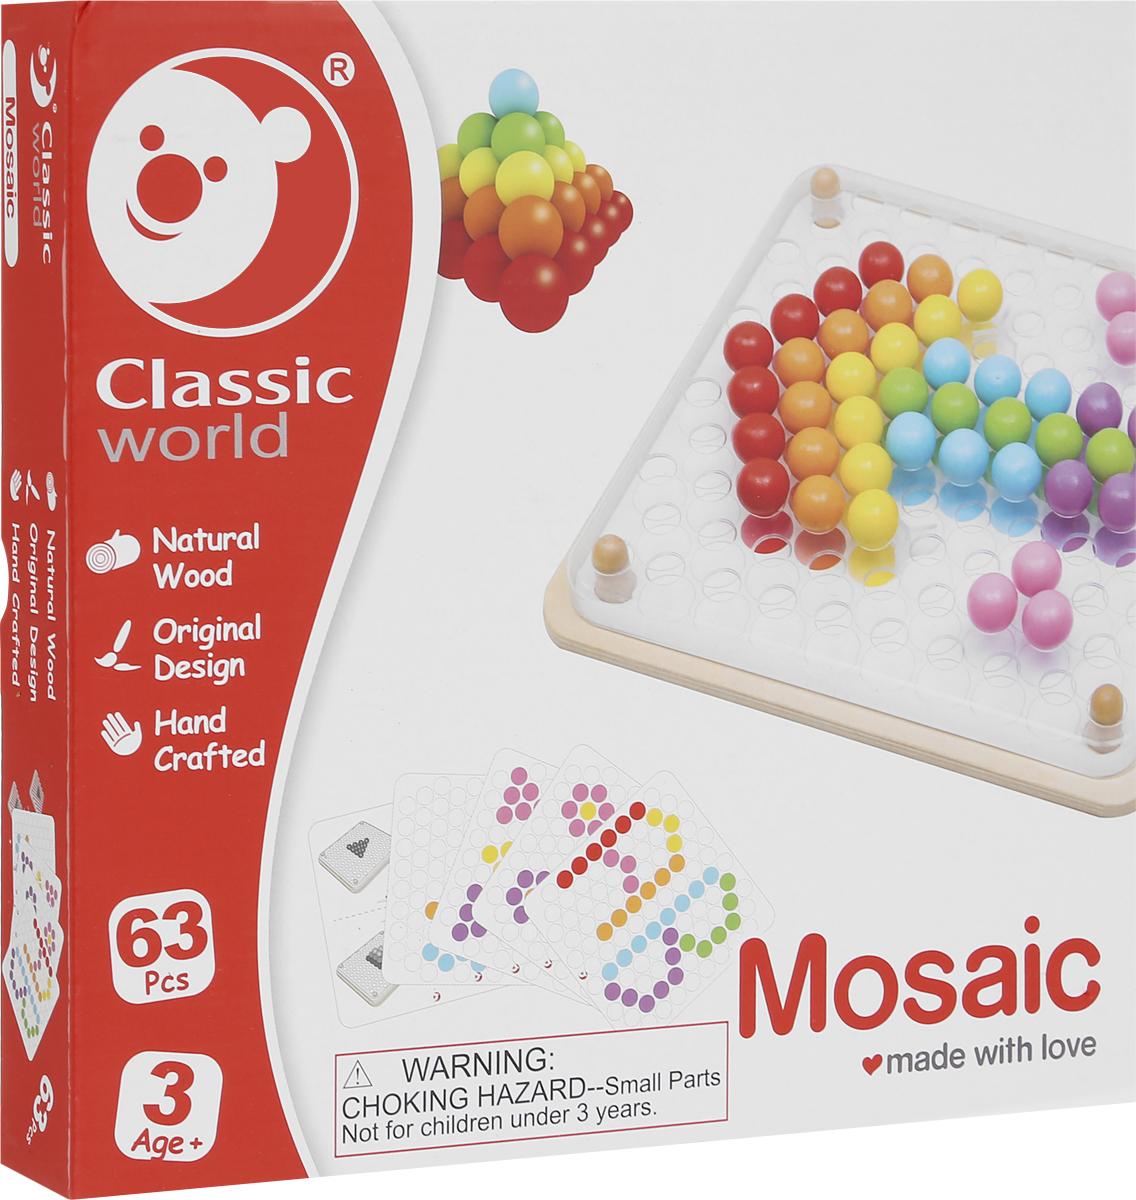 Classic World Мозаика Волшебные шарики 3597